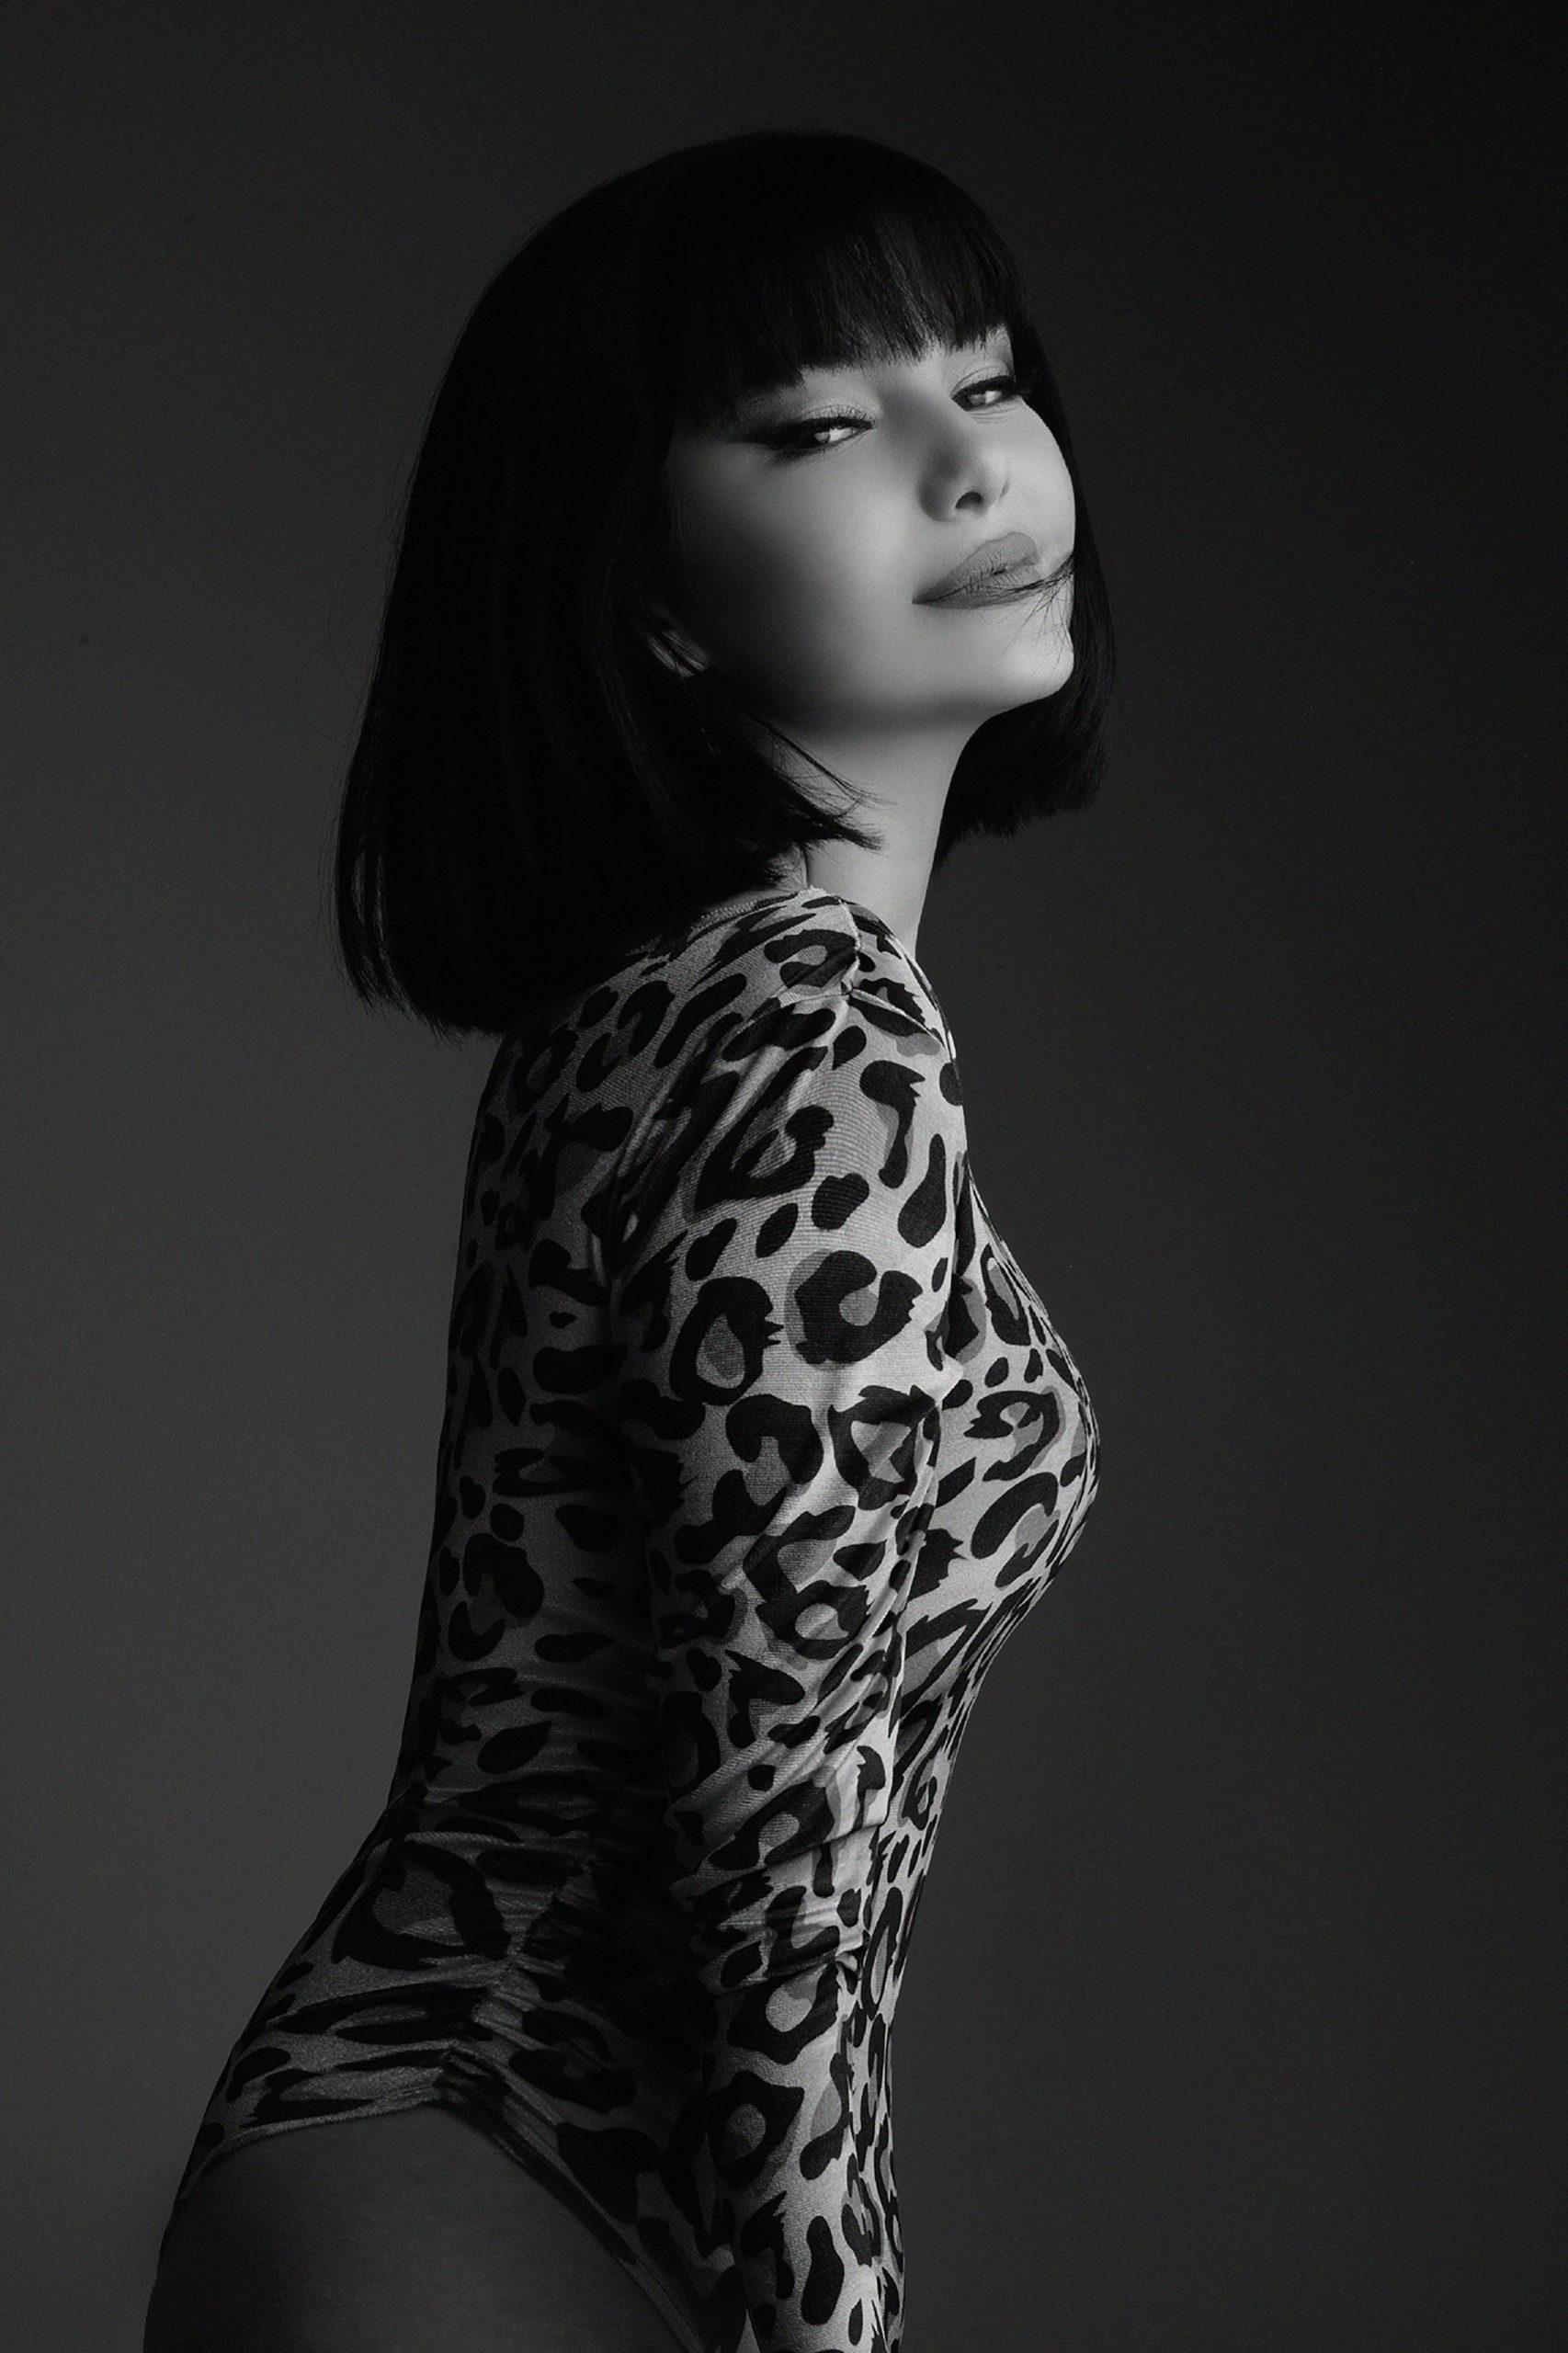 Black and white studio photography